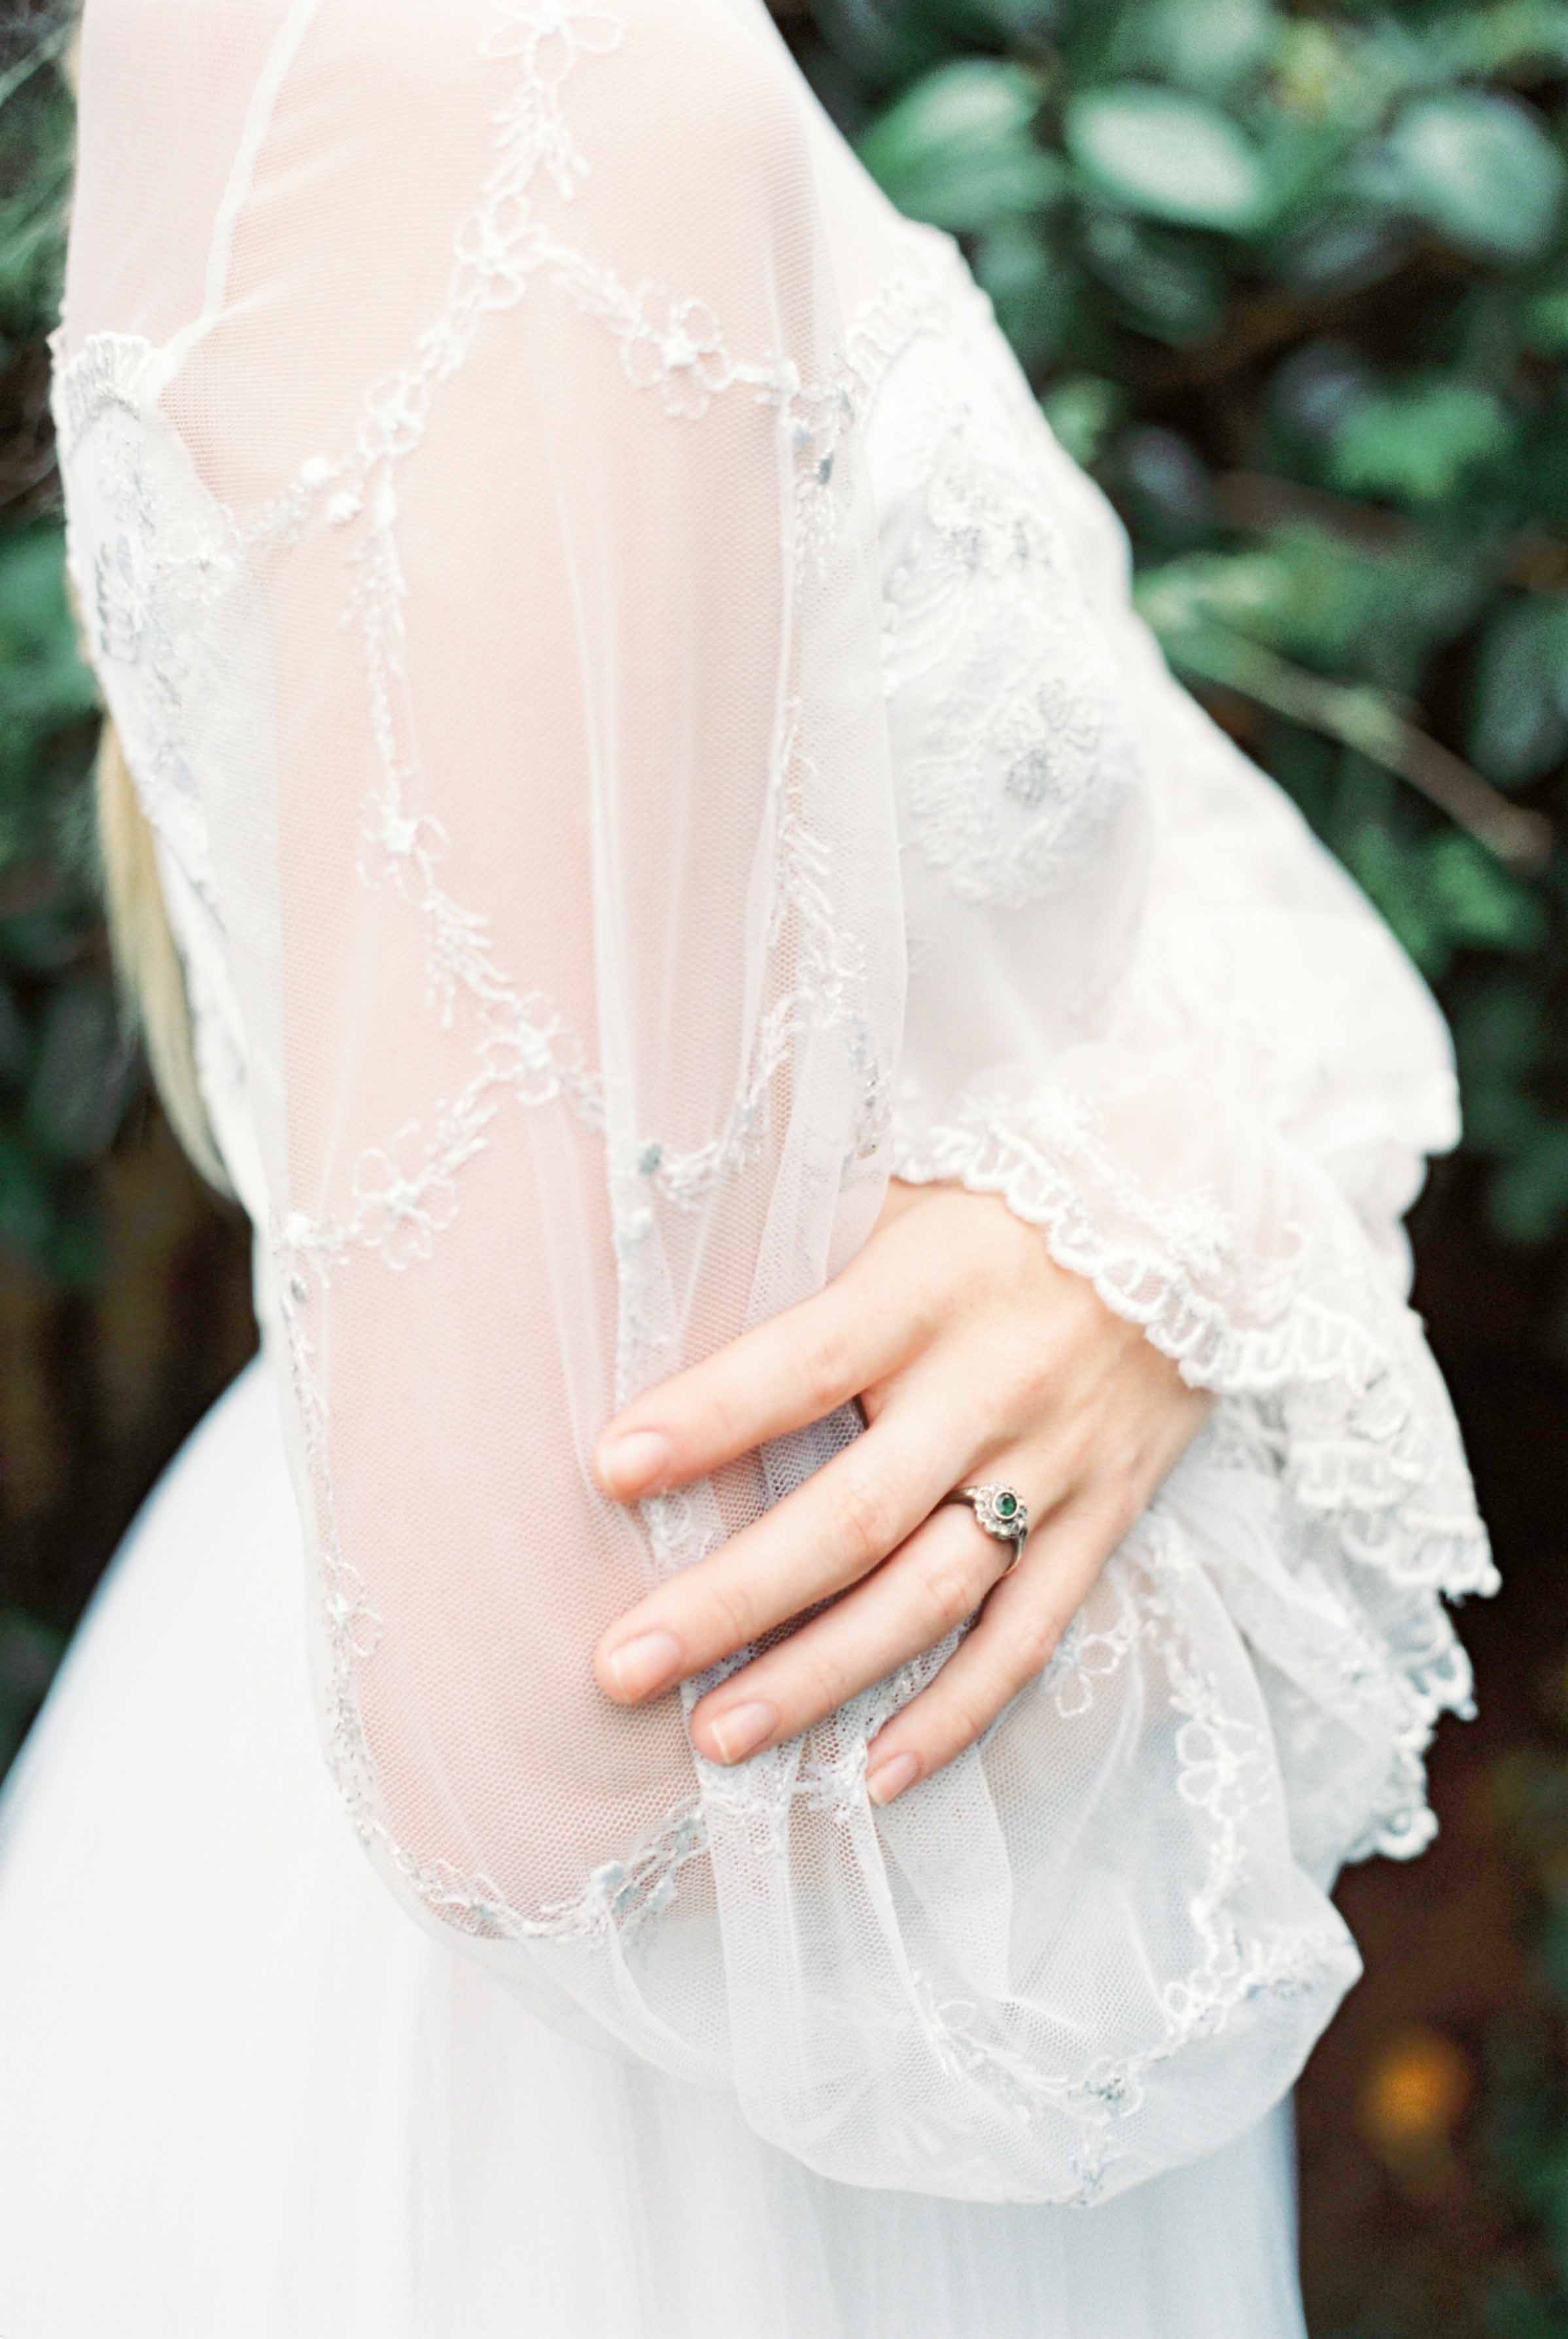 dorset-fine-art-wedding-photographer_amelia_carmencita_lores-22-of-24